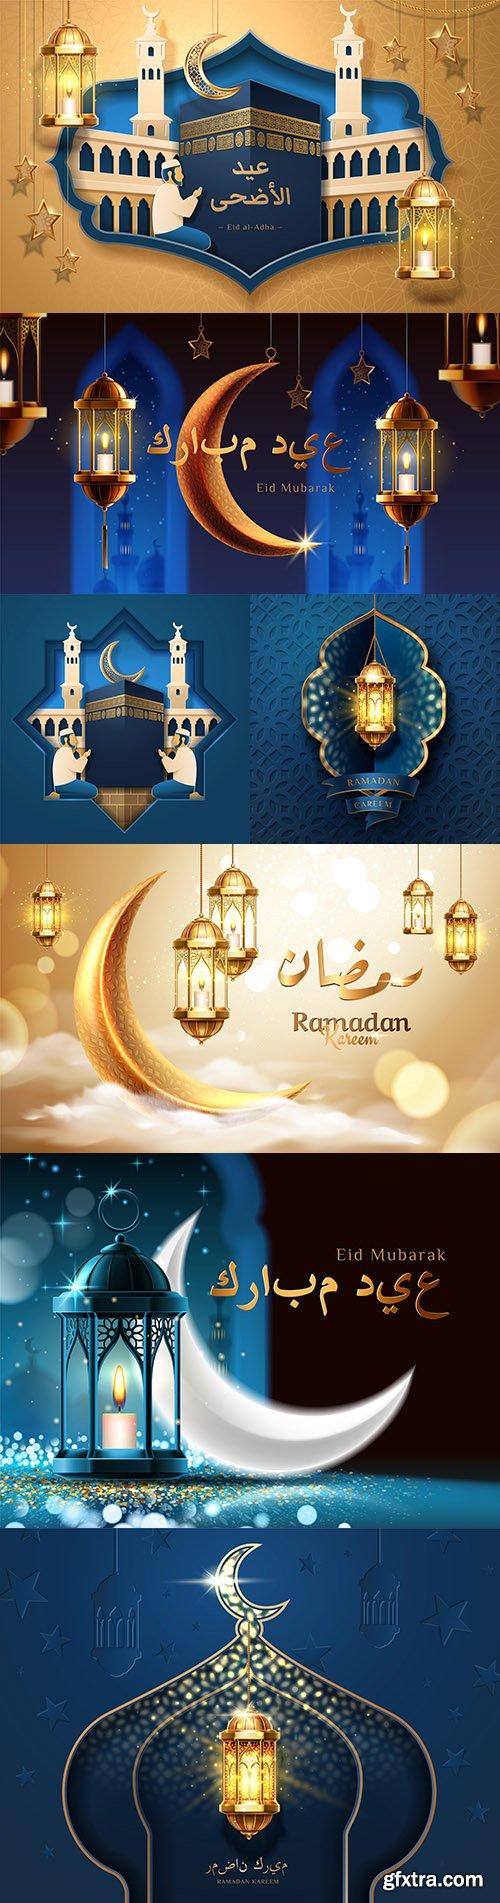 Ramadan Kareem and Eid Mubarak background greeting card